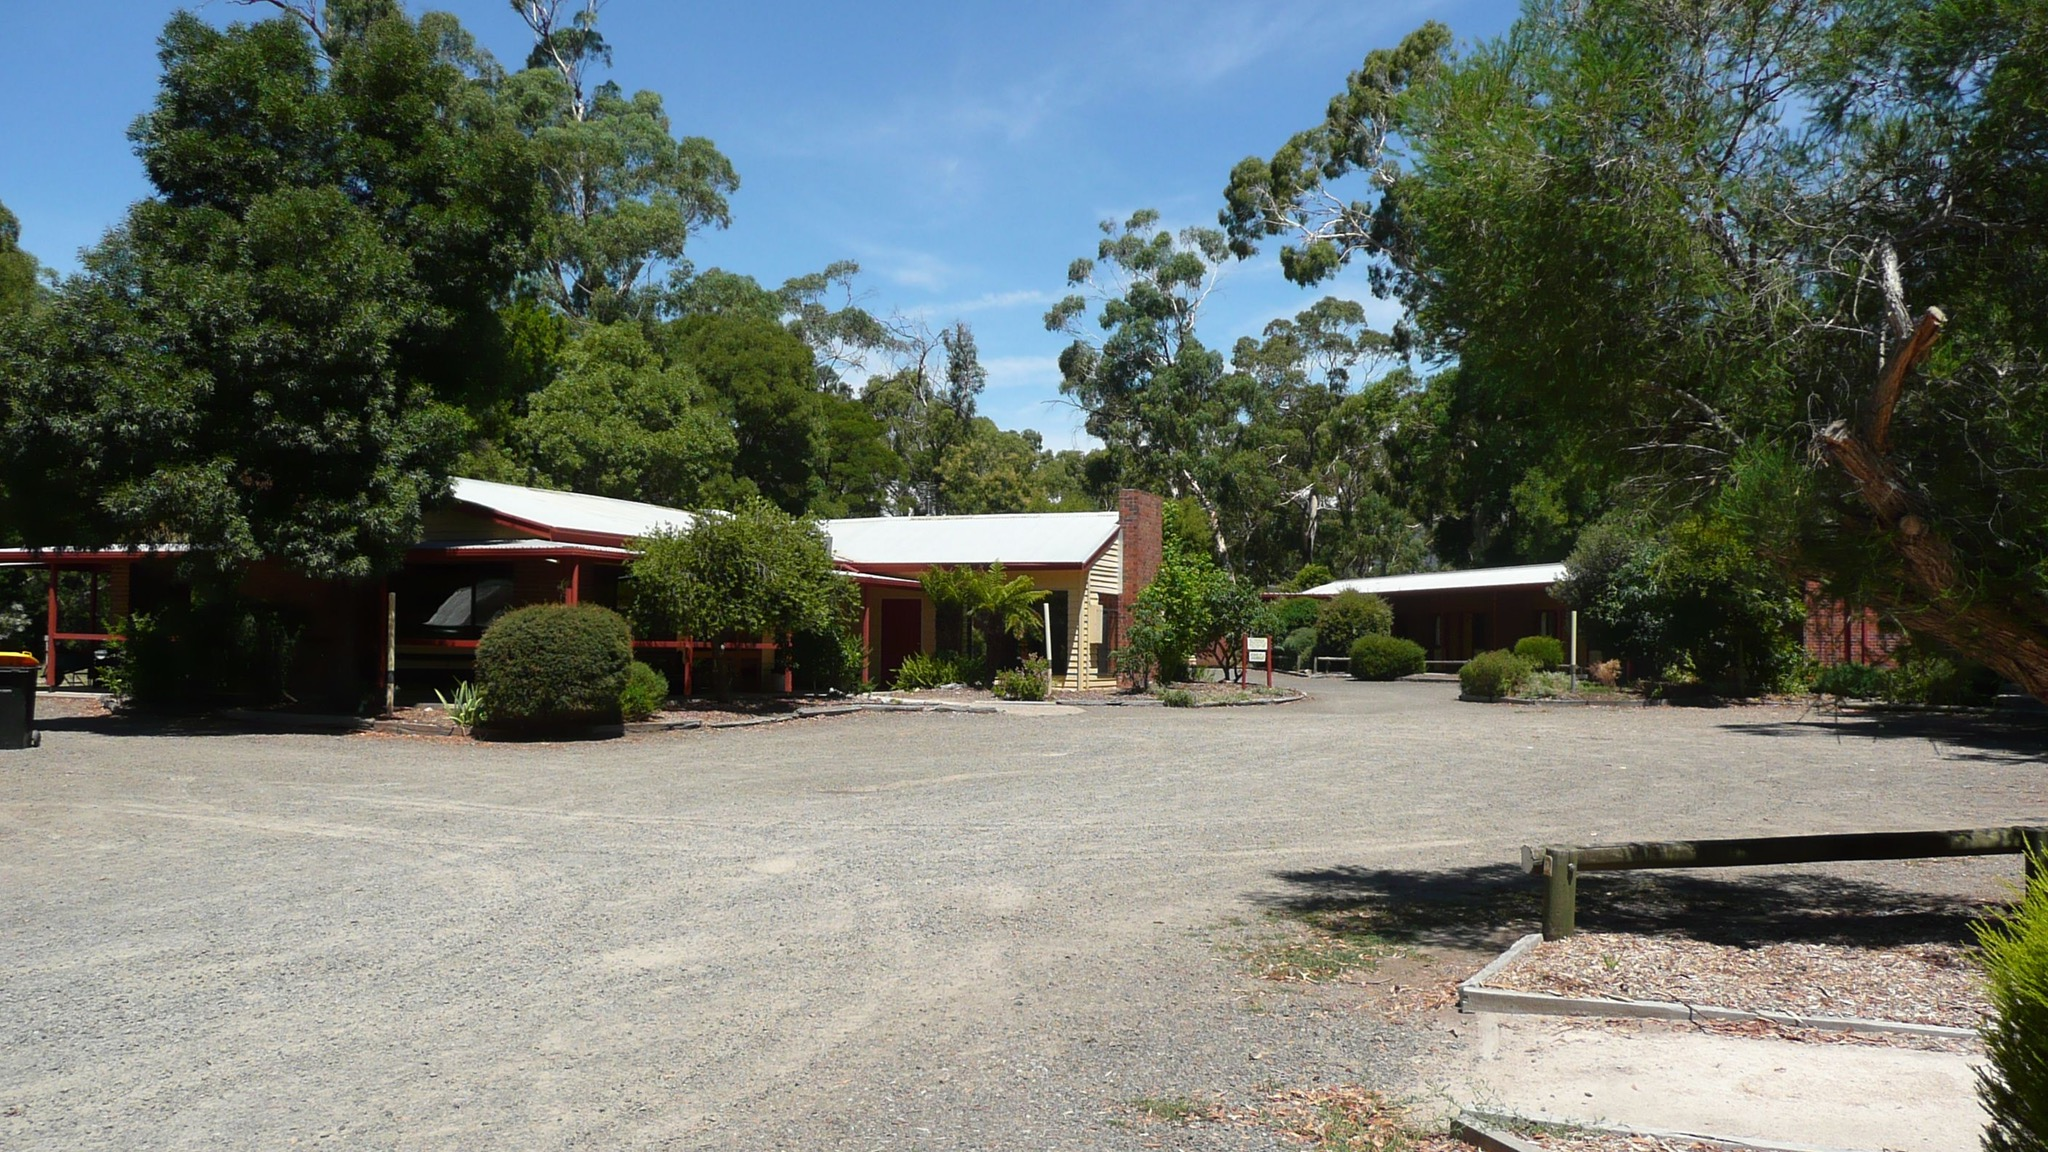 Camp Acacia